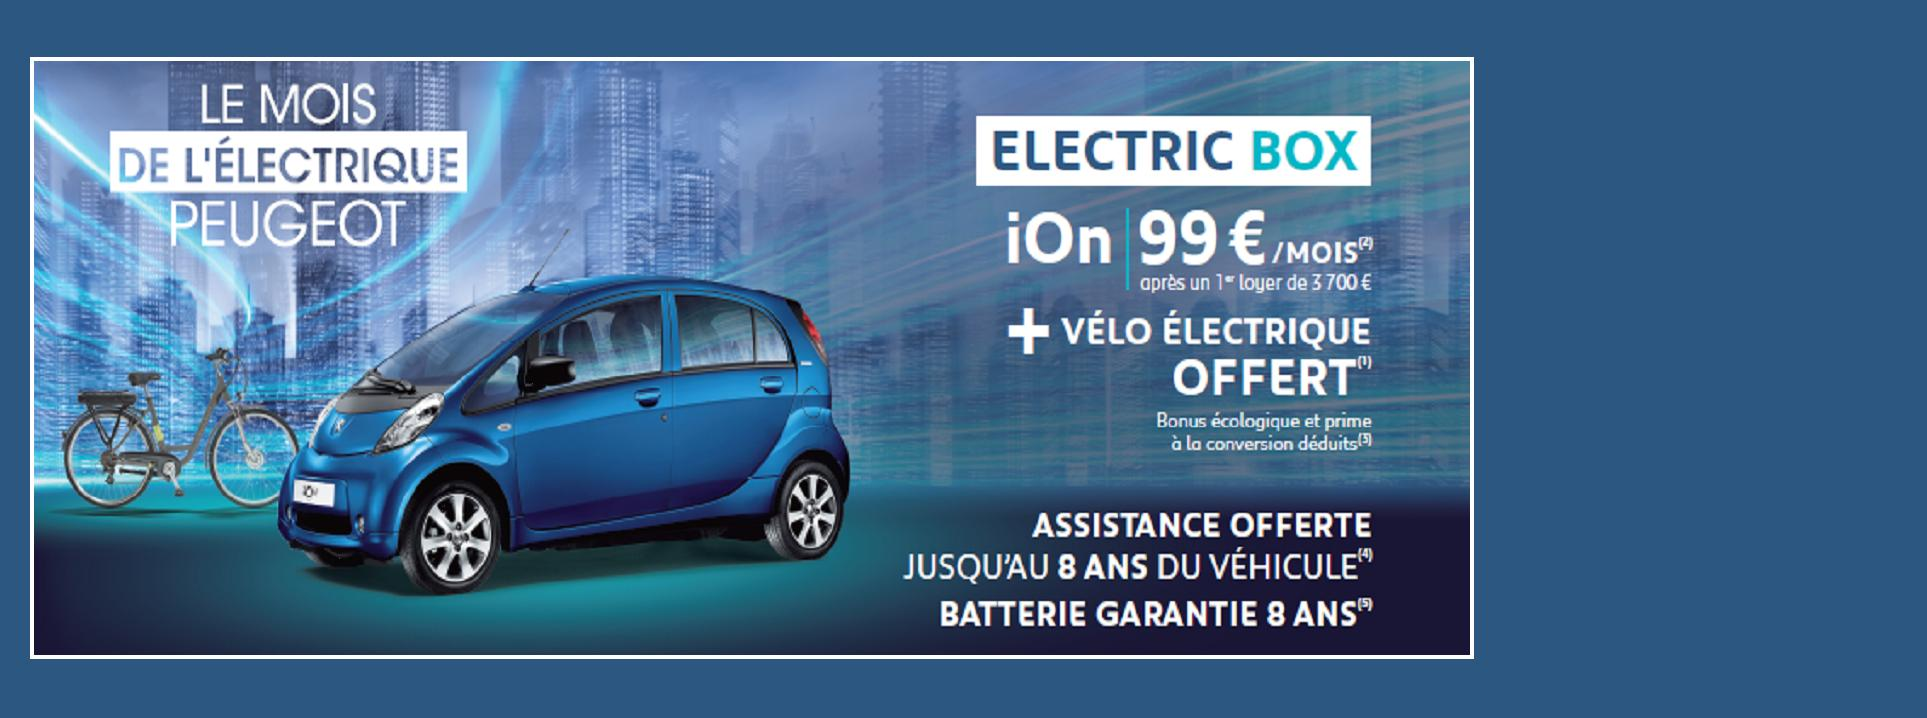 Peugeot valence concessionnaire garage dr me 26 for Garage le loarer peugeot lannion